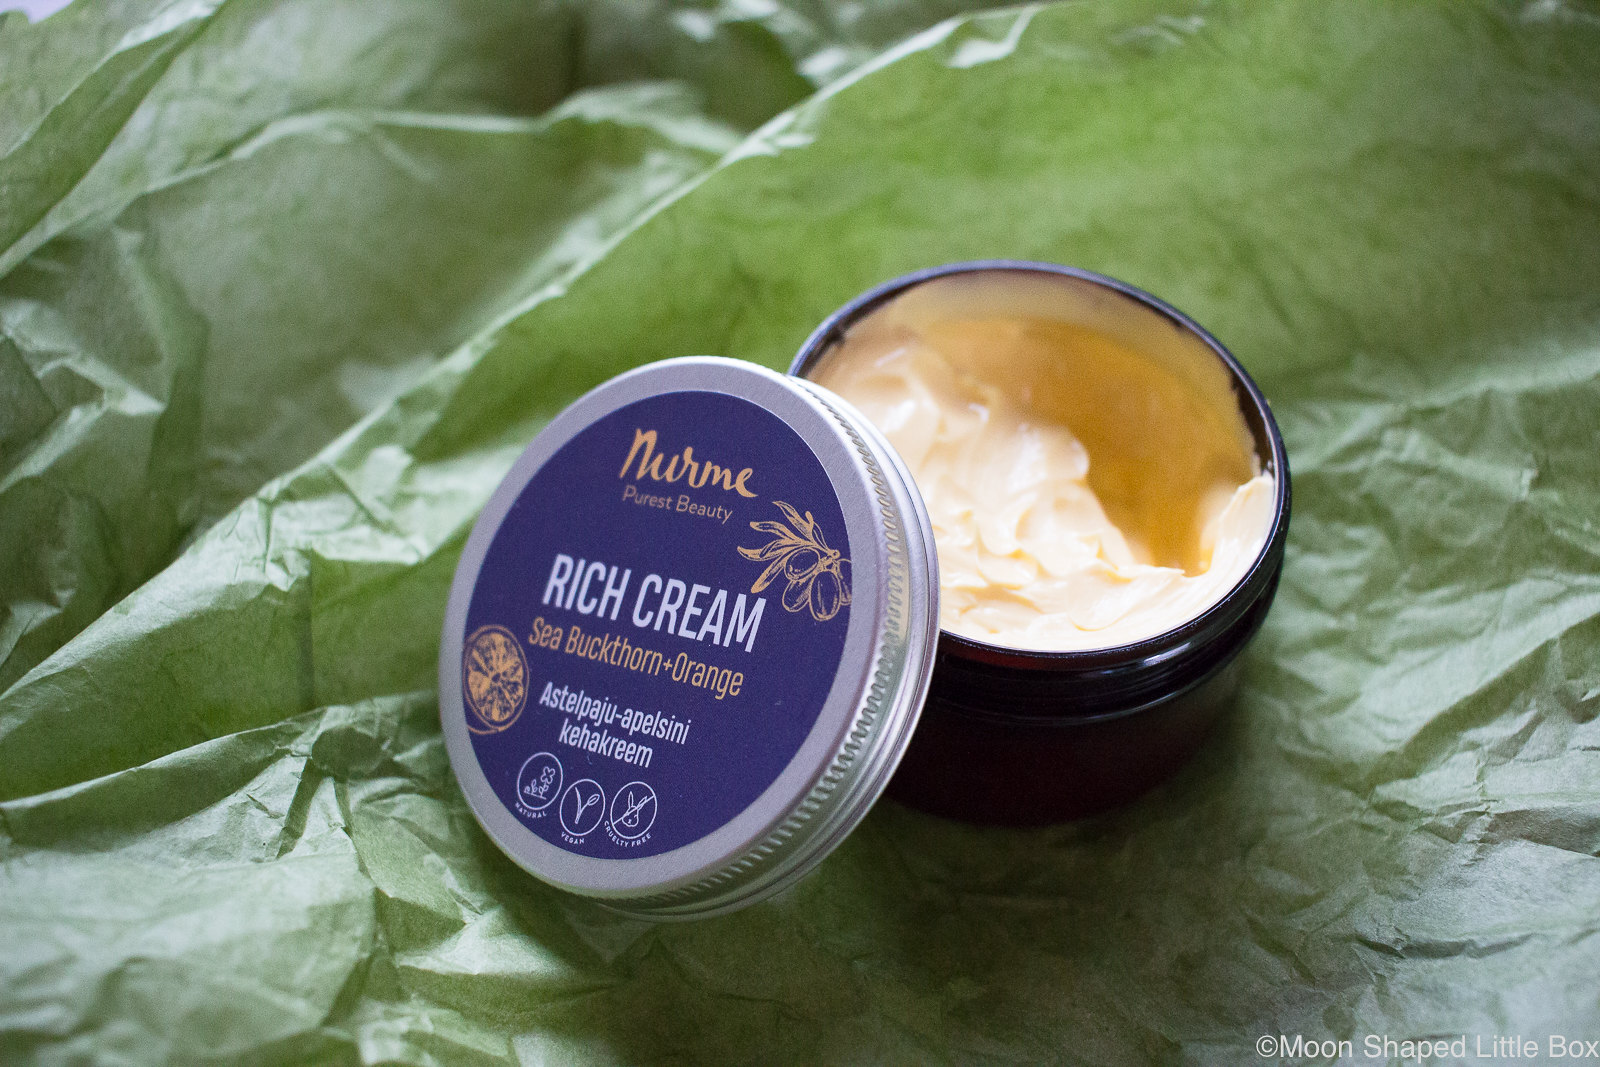 Nurme-uutuudet-rich-cream